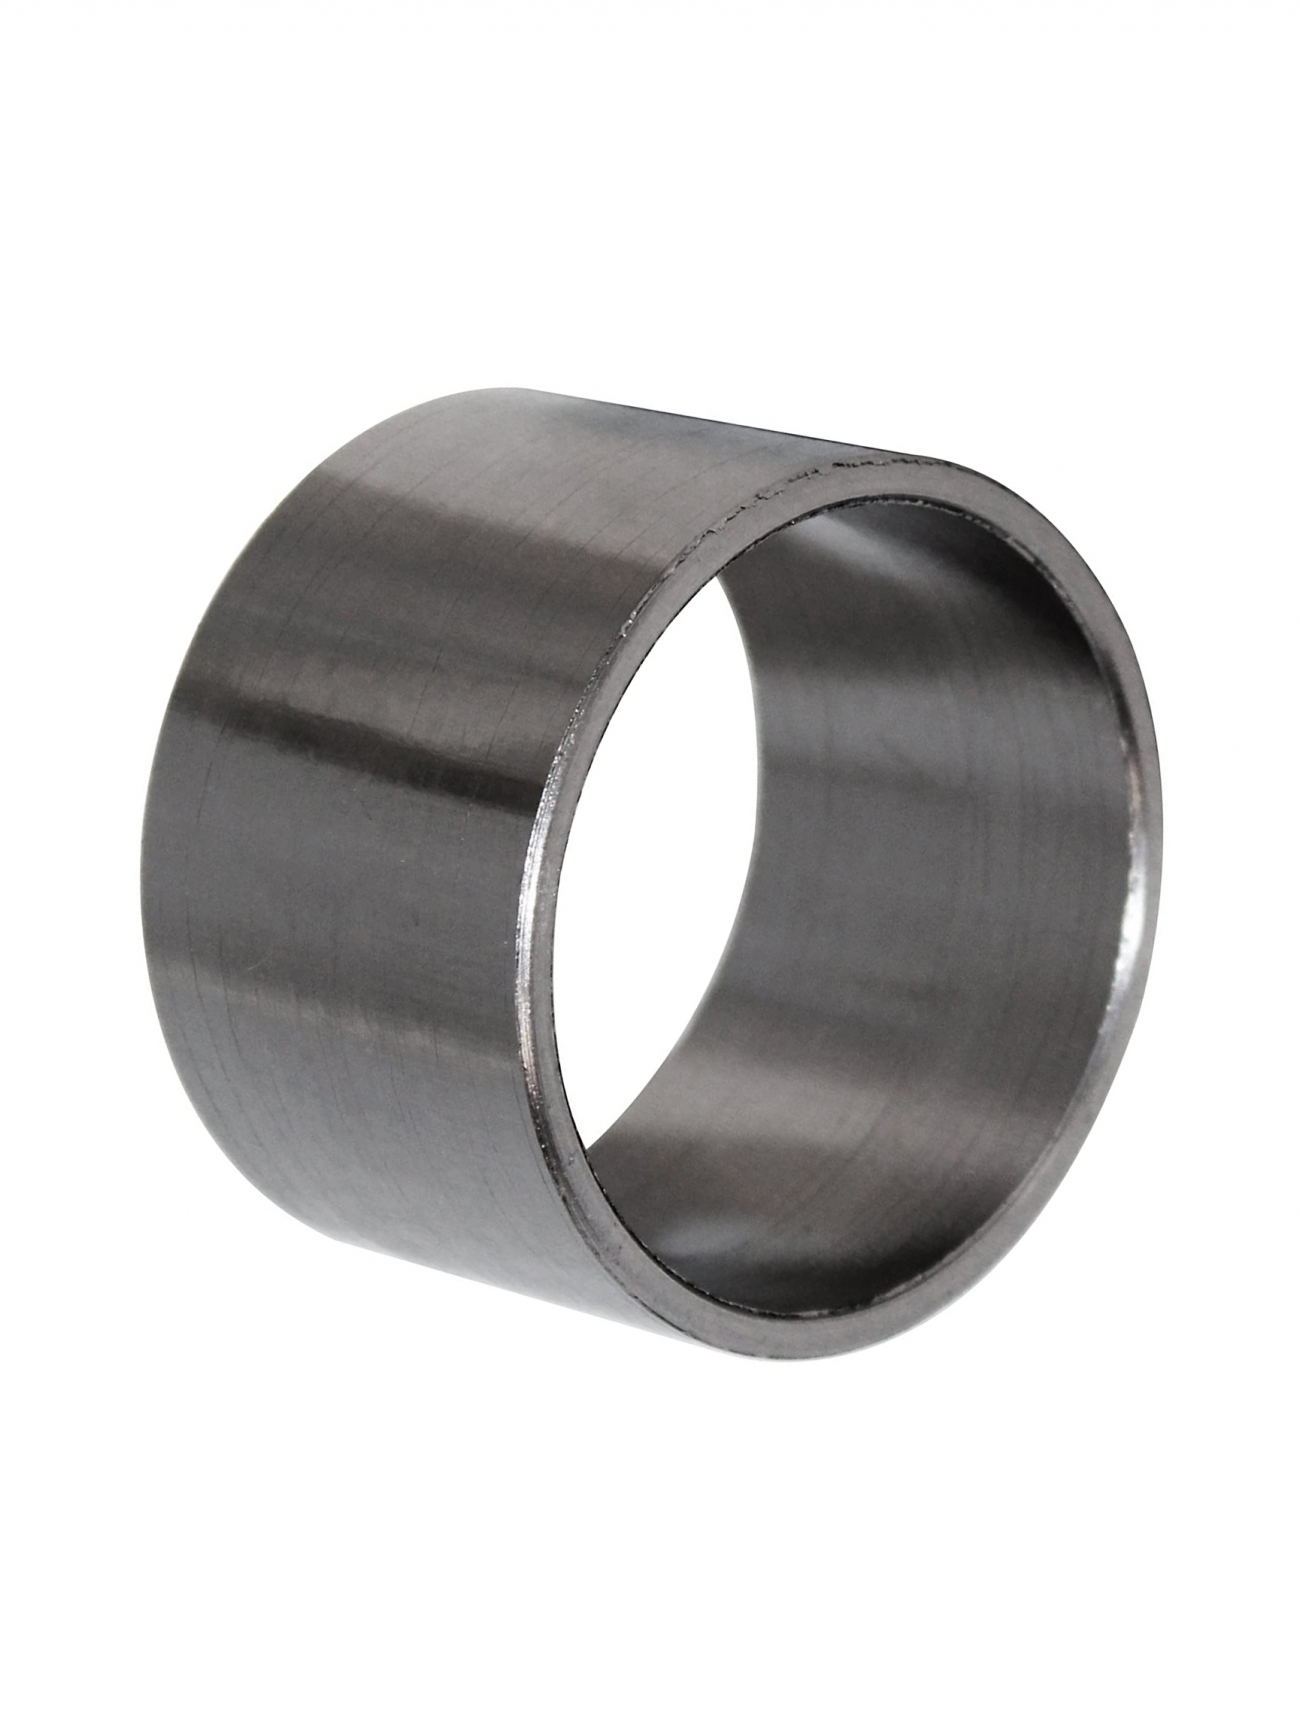 Кольцо на салфетку металлическое